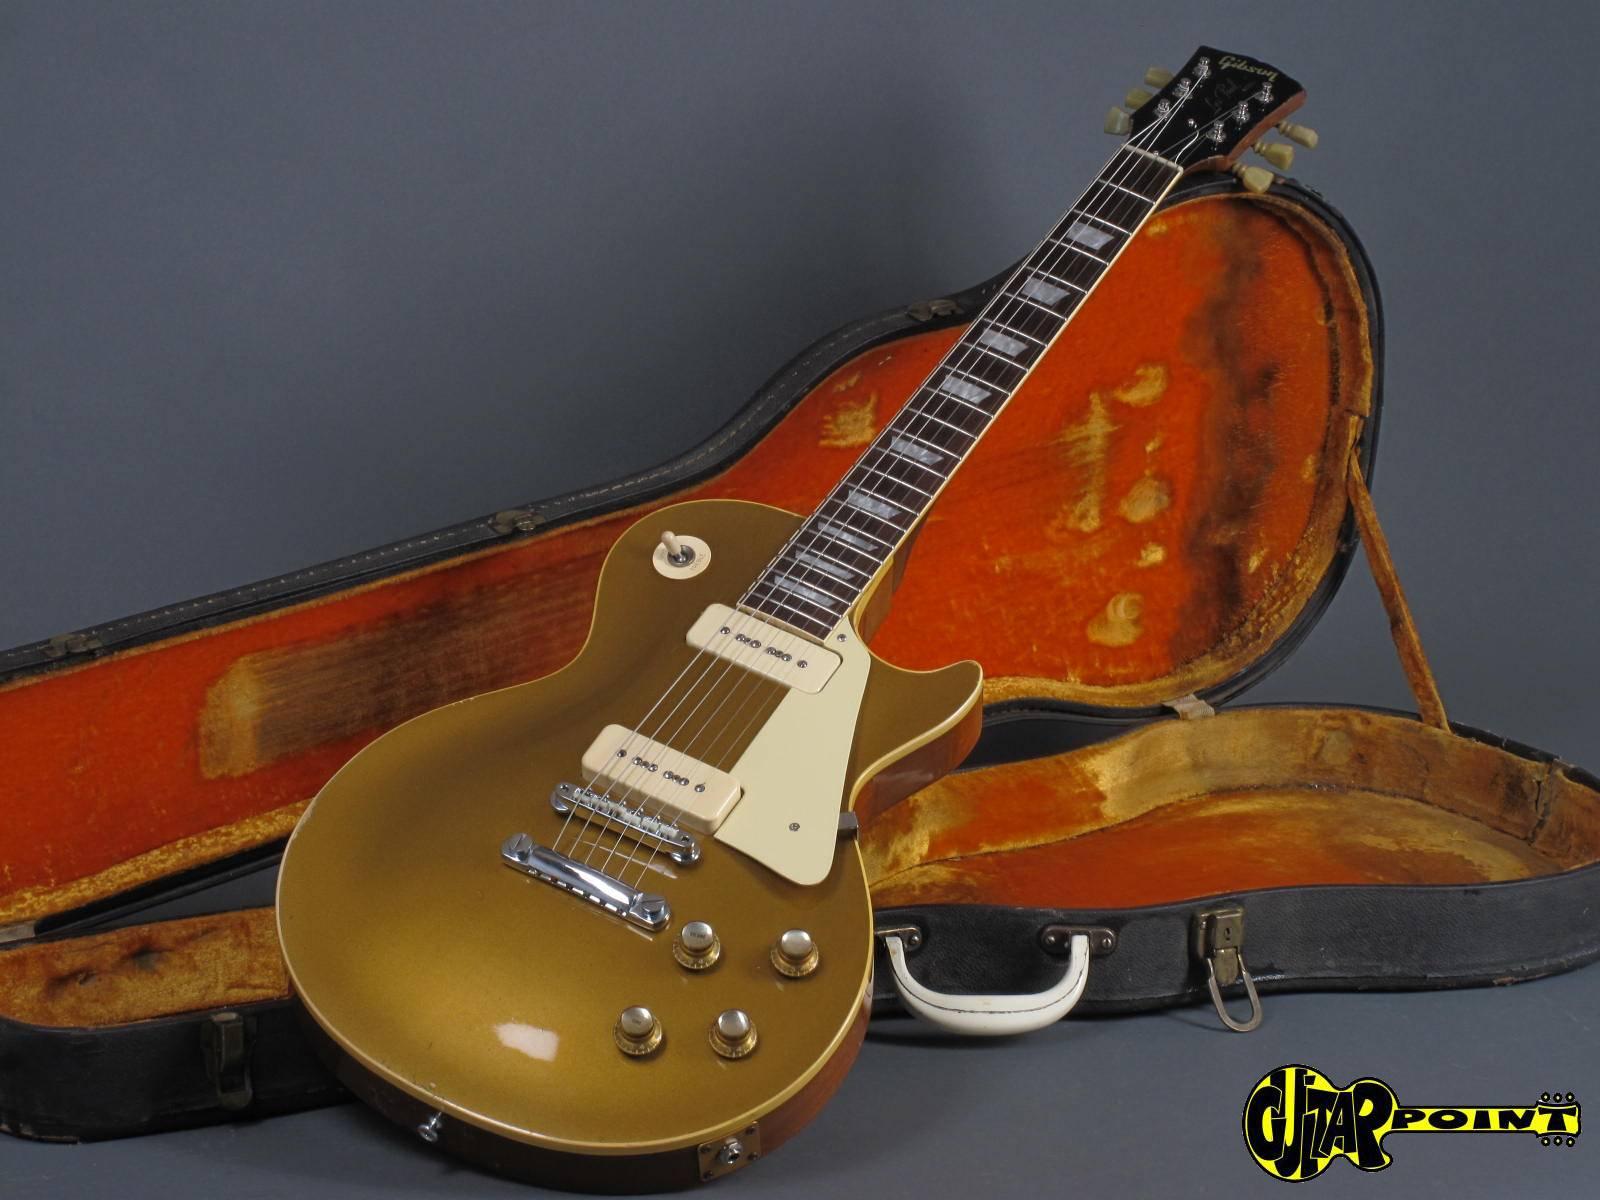 gibson les paul standard goldtop 1968 gold metallic guitar for sale guitarpoint. Black Bedroom Furniture Sets. Home Design Ideas